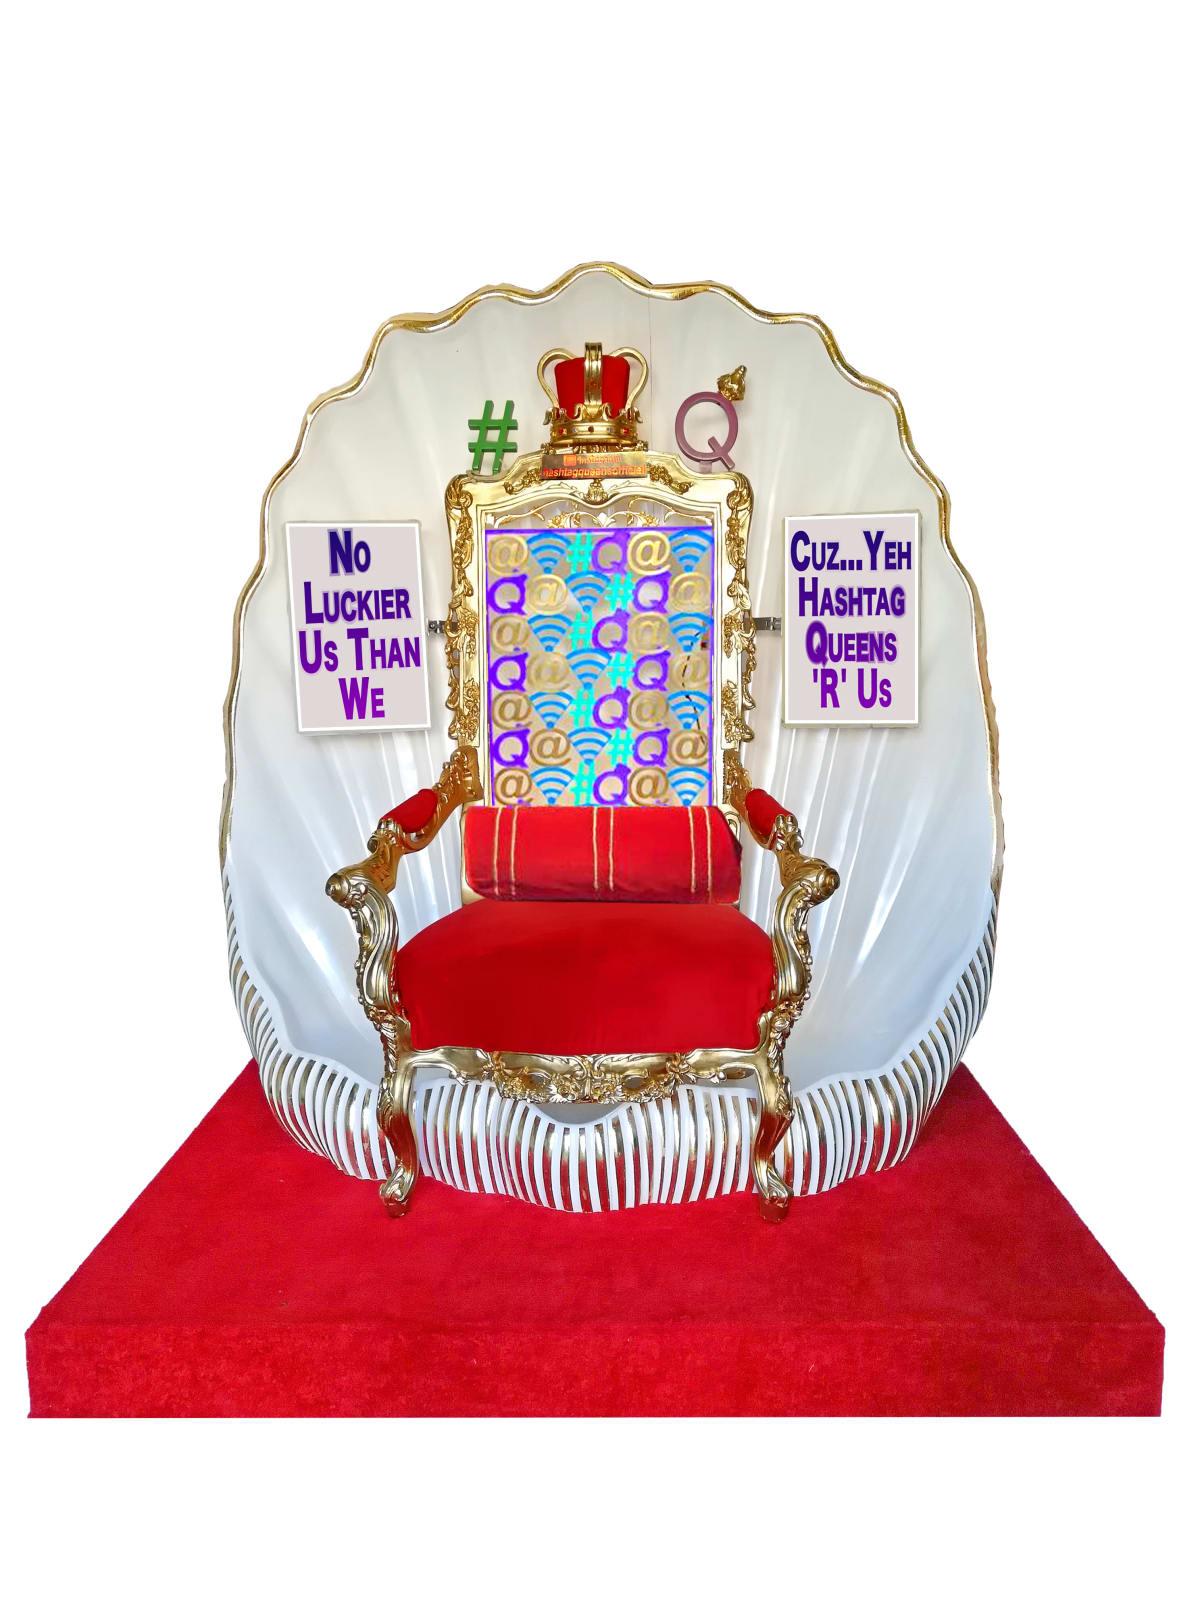 Robodrone Hashtag Queens throne Mix Media